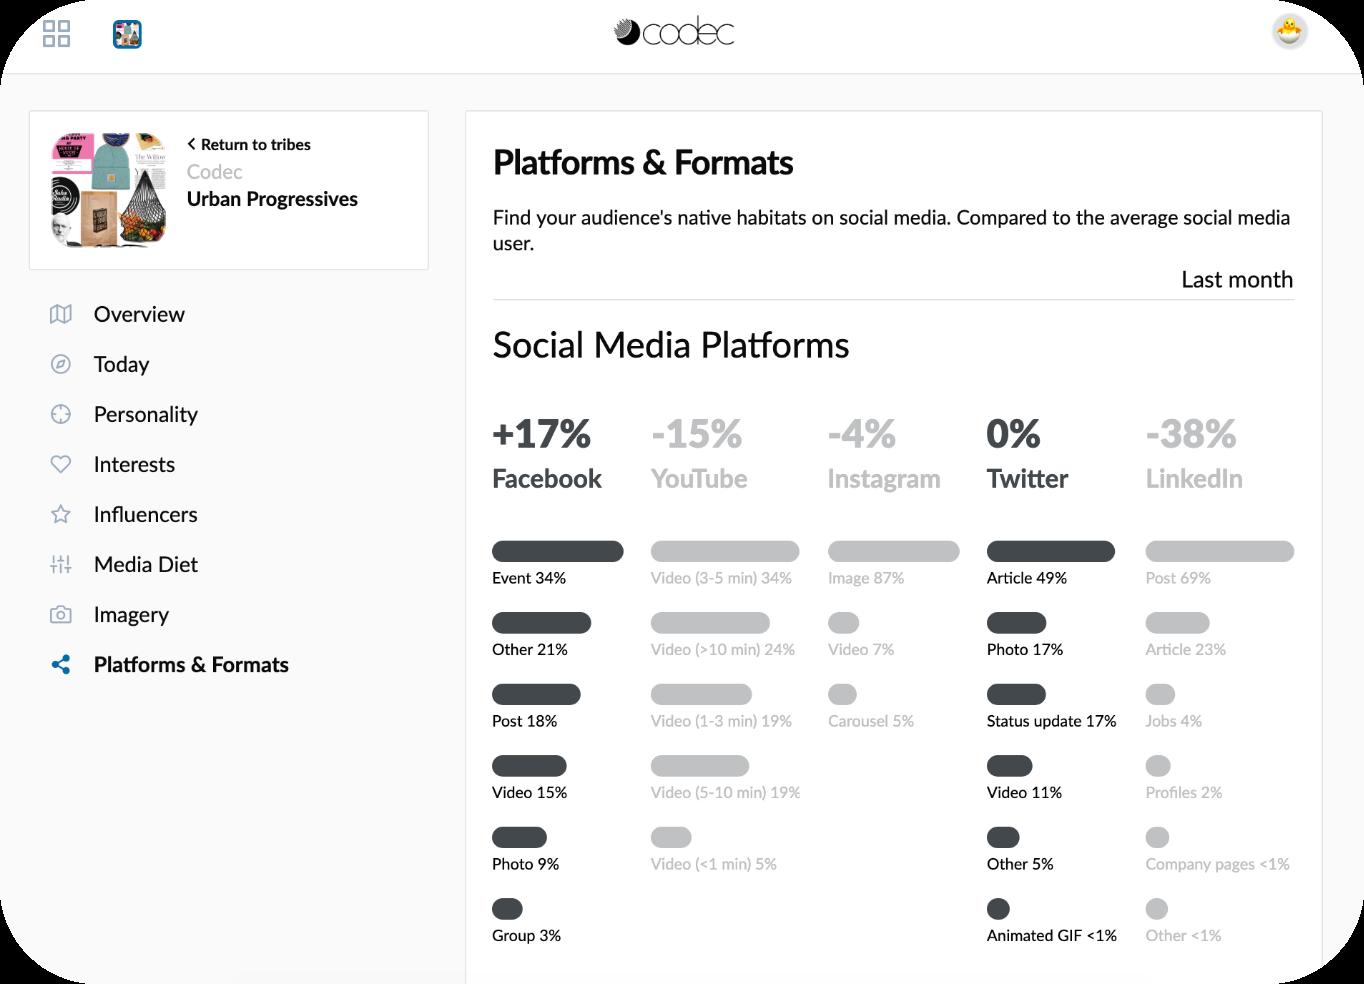 Platforms & Formats